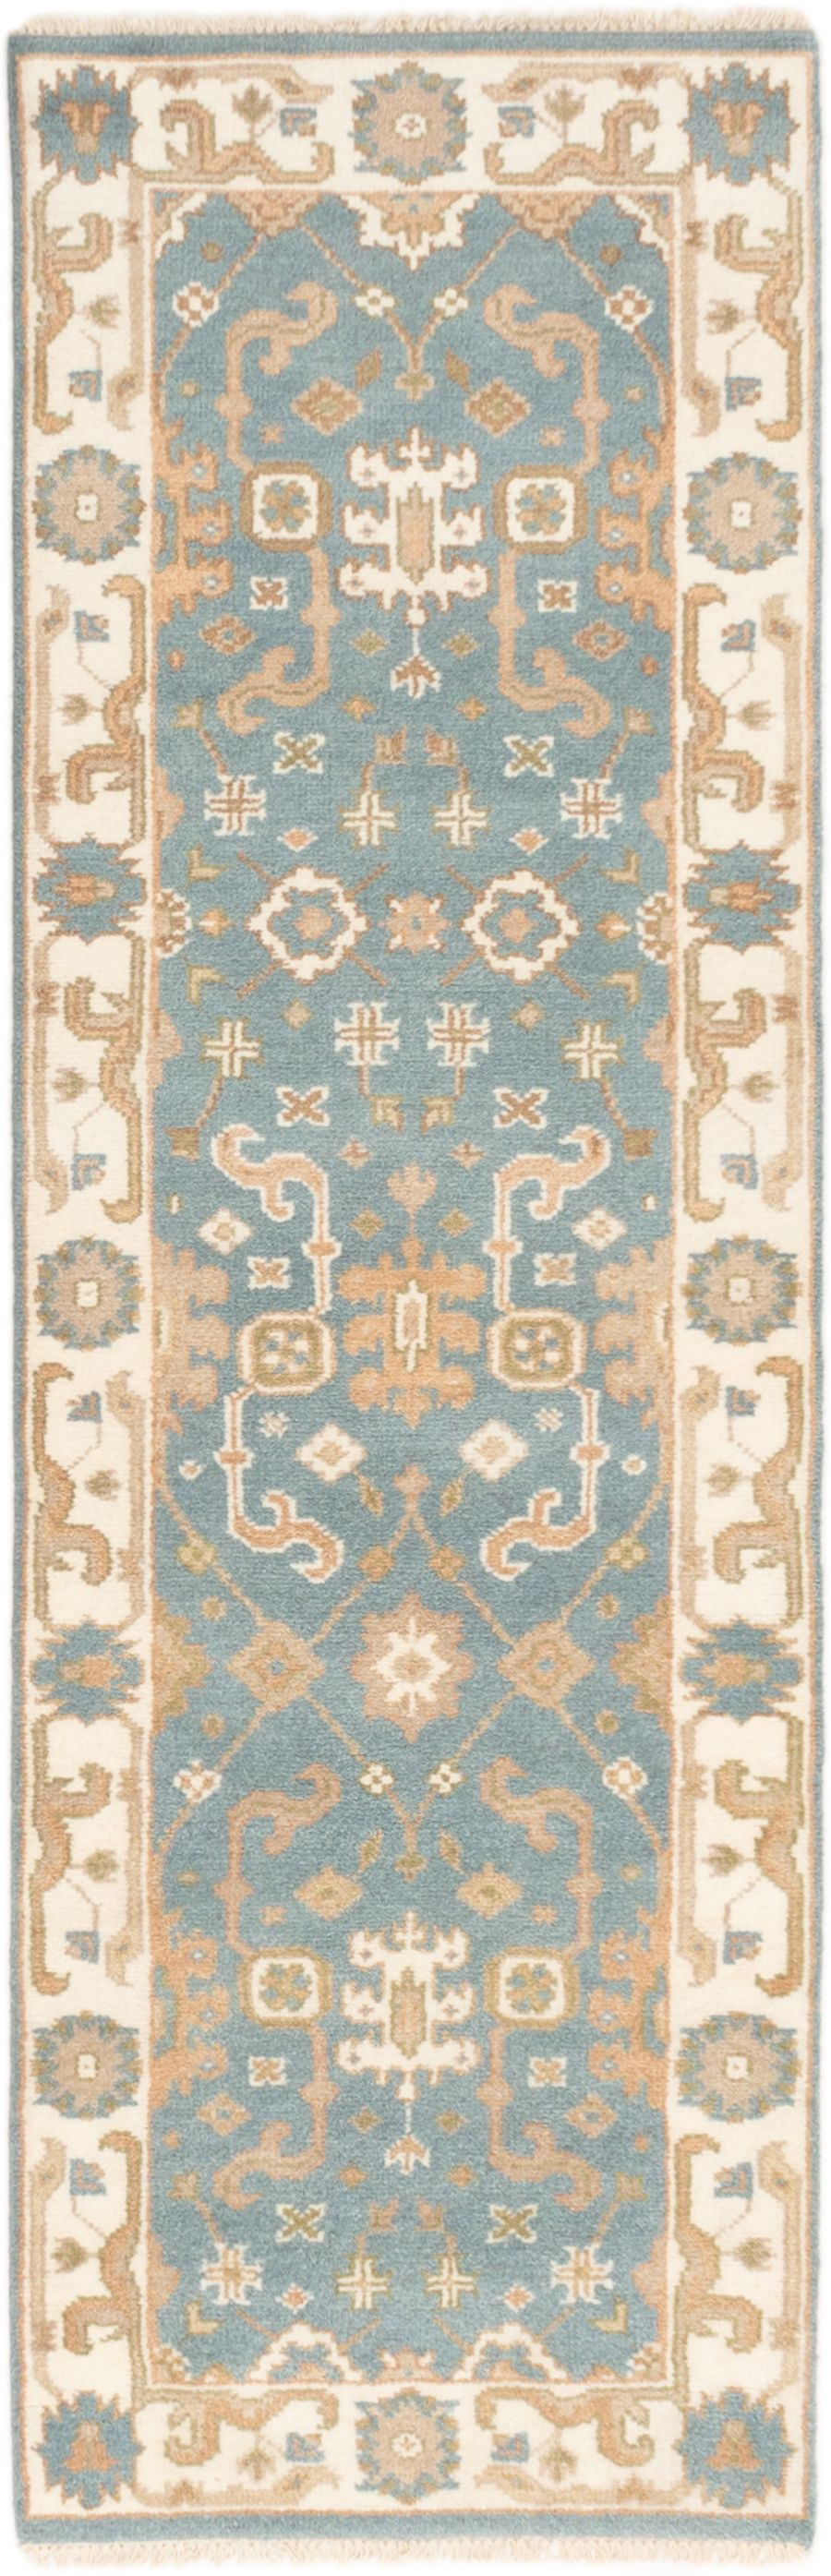 "Hand-knotted Royal Ushak Light Denim Blue,  Wool Rug 2'7"" x 8'0""  Size: 2'7"" x 8'0"""